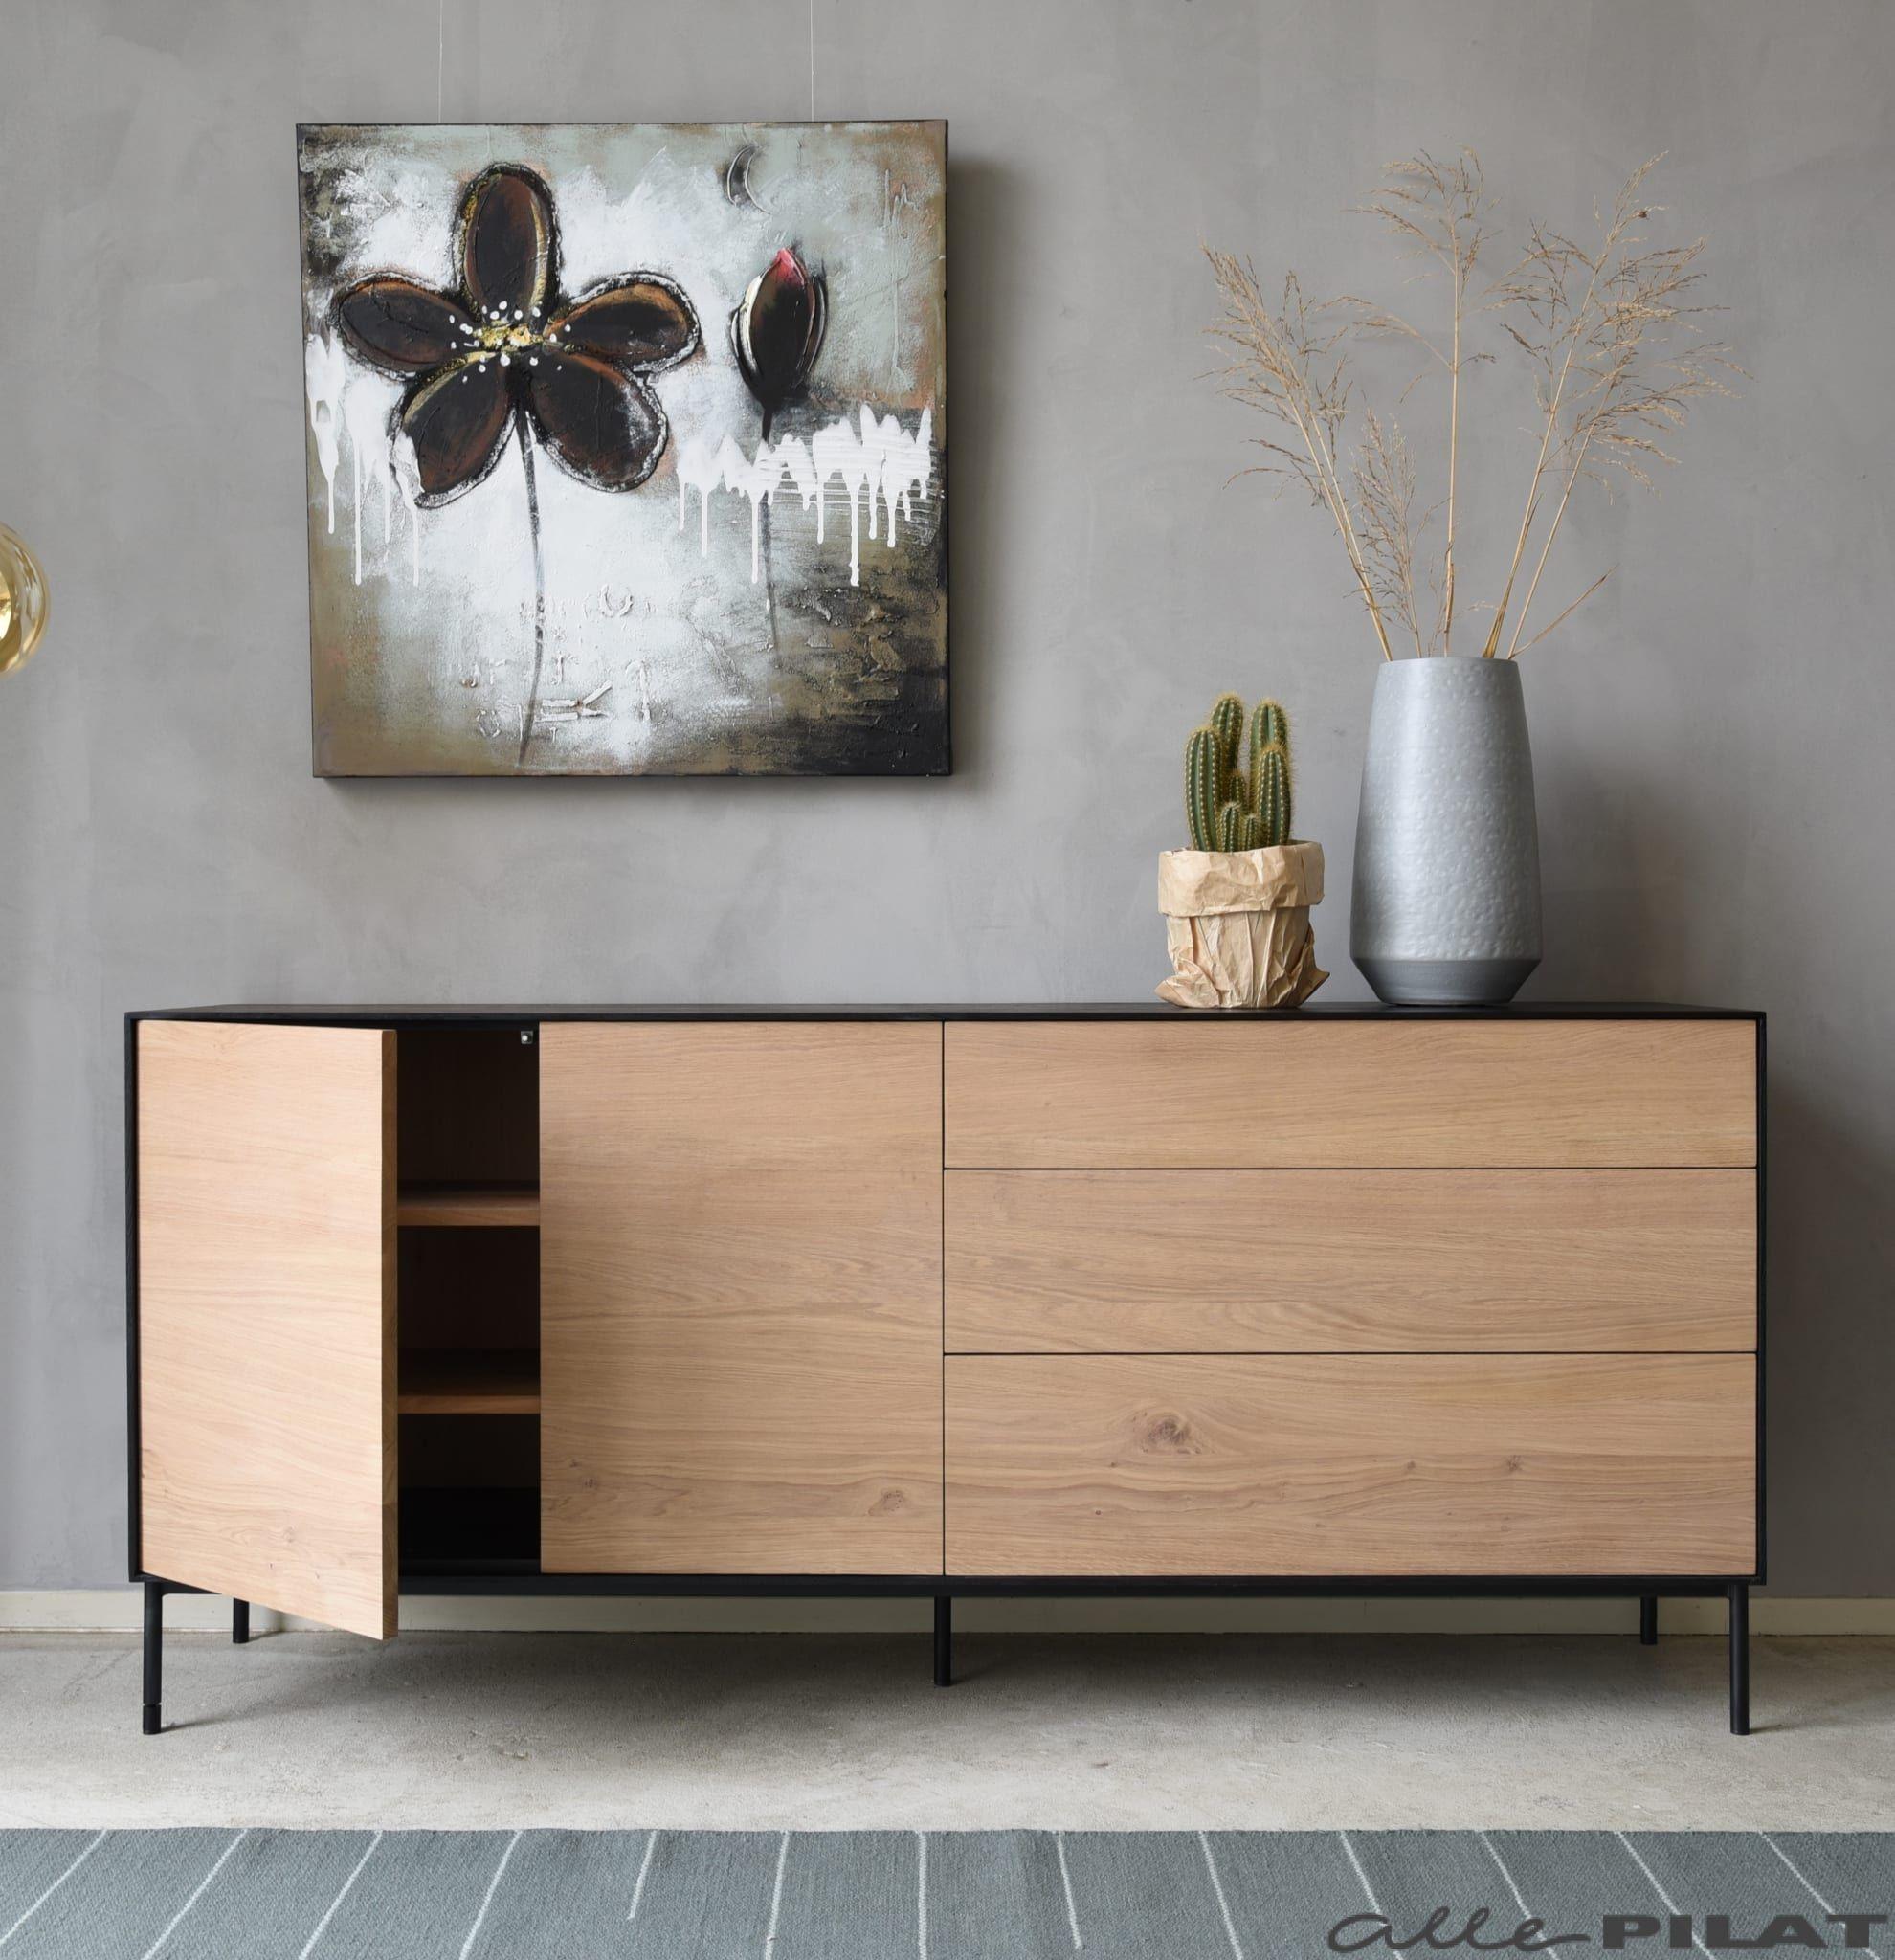 Eiken Dressoir Swart Van Massief Eikenhout Woonwinkel Alle Pilat Dressoir Decor Kamer Decoratie Interieur Woonkamer